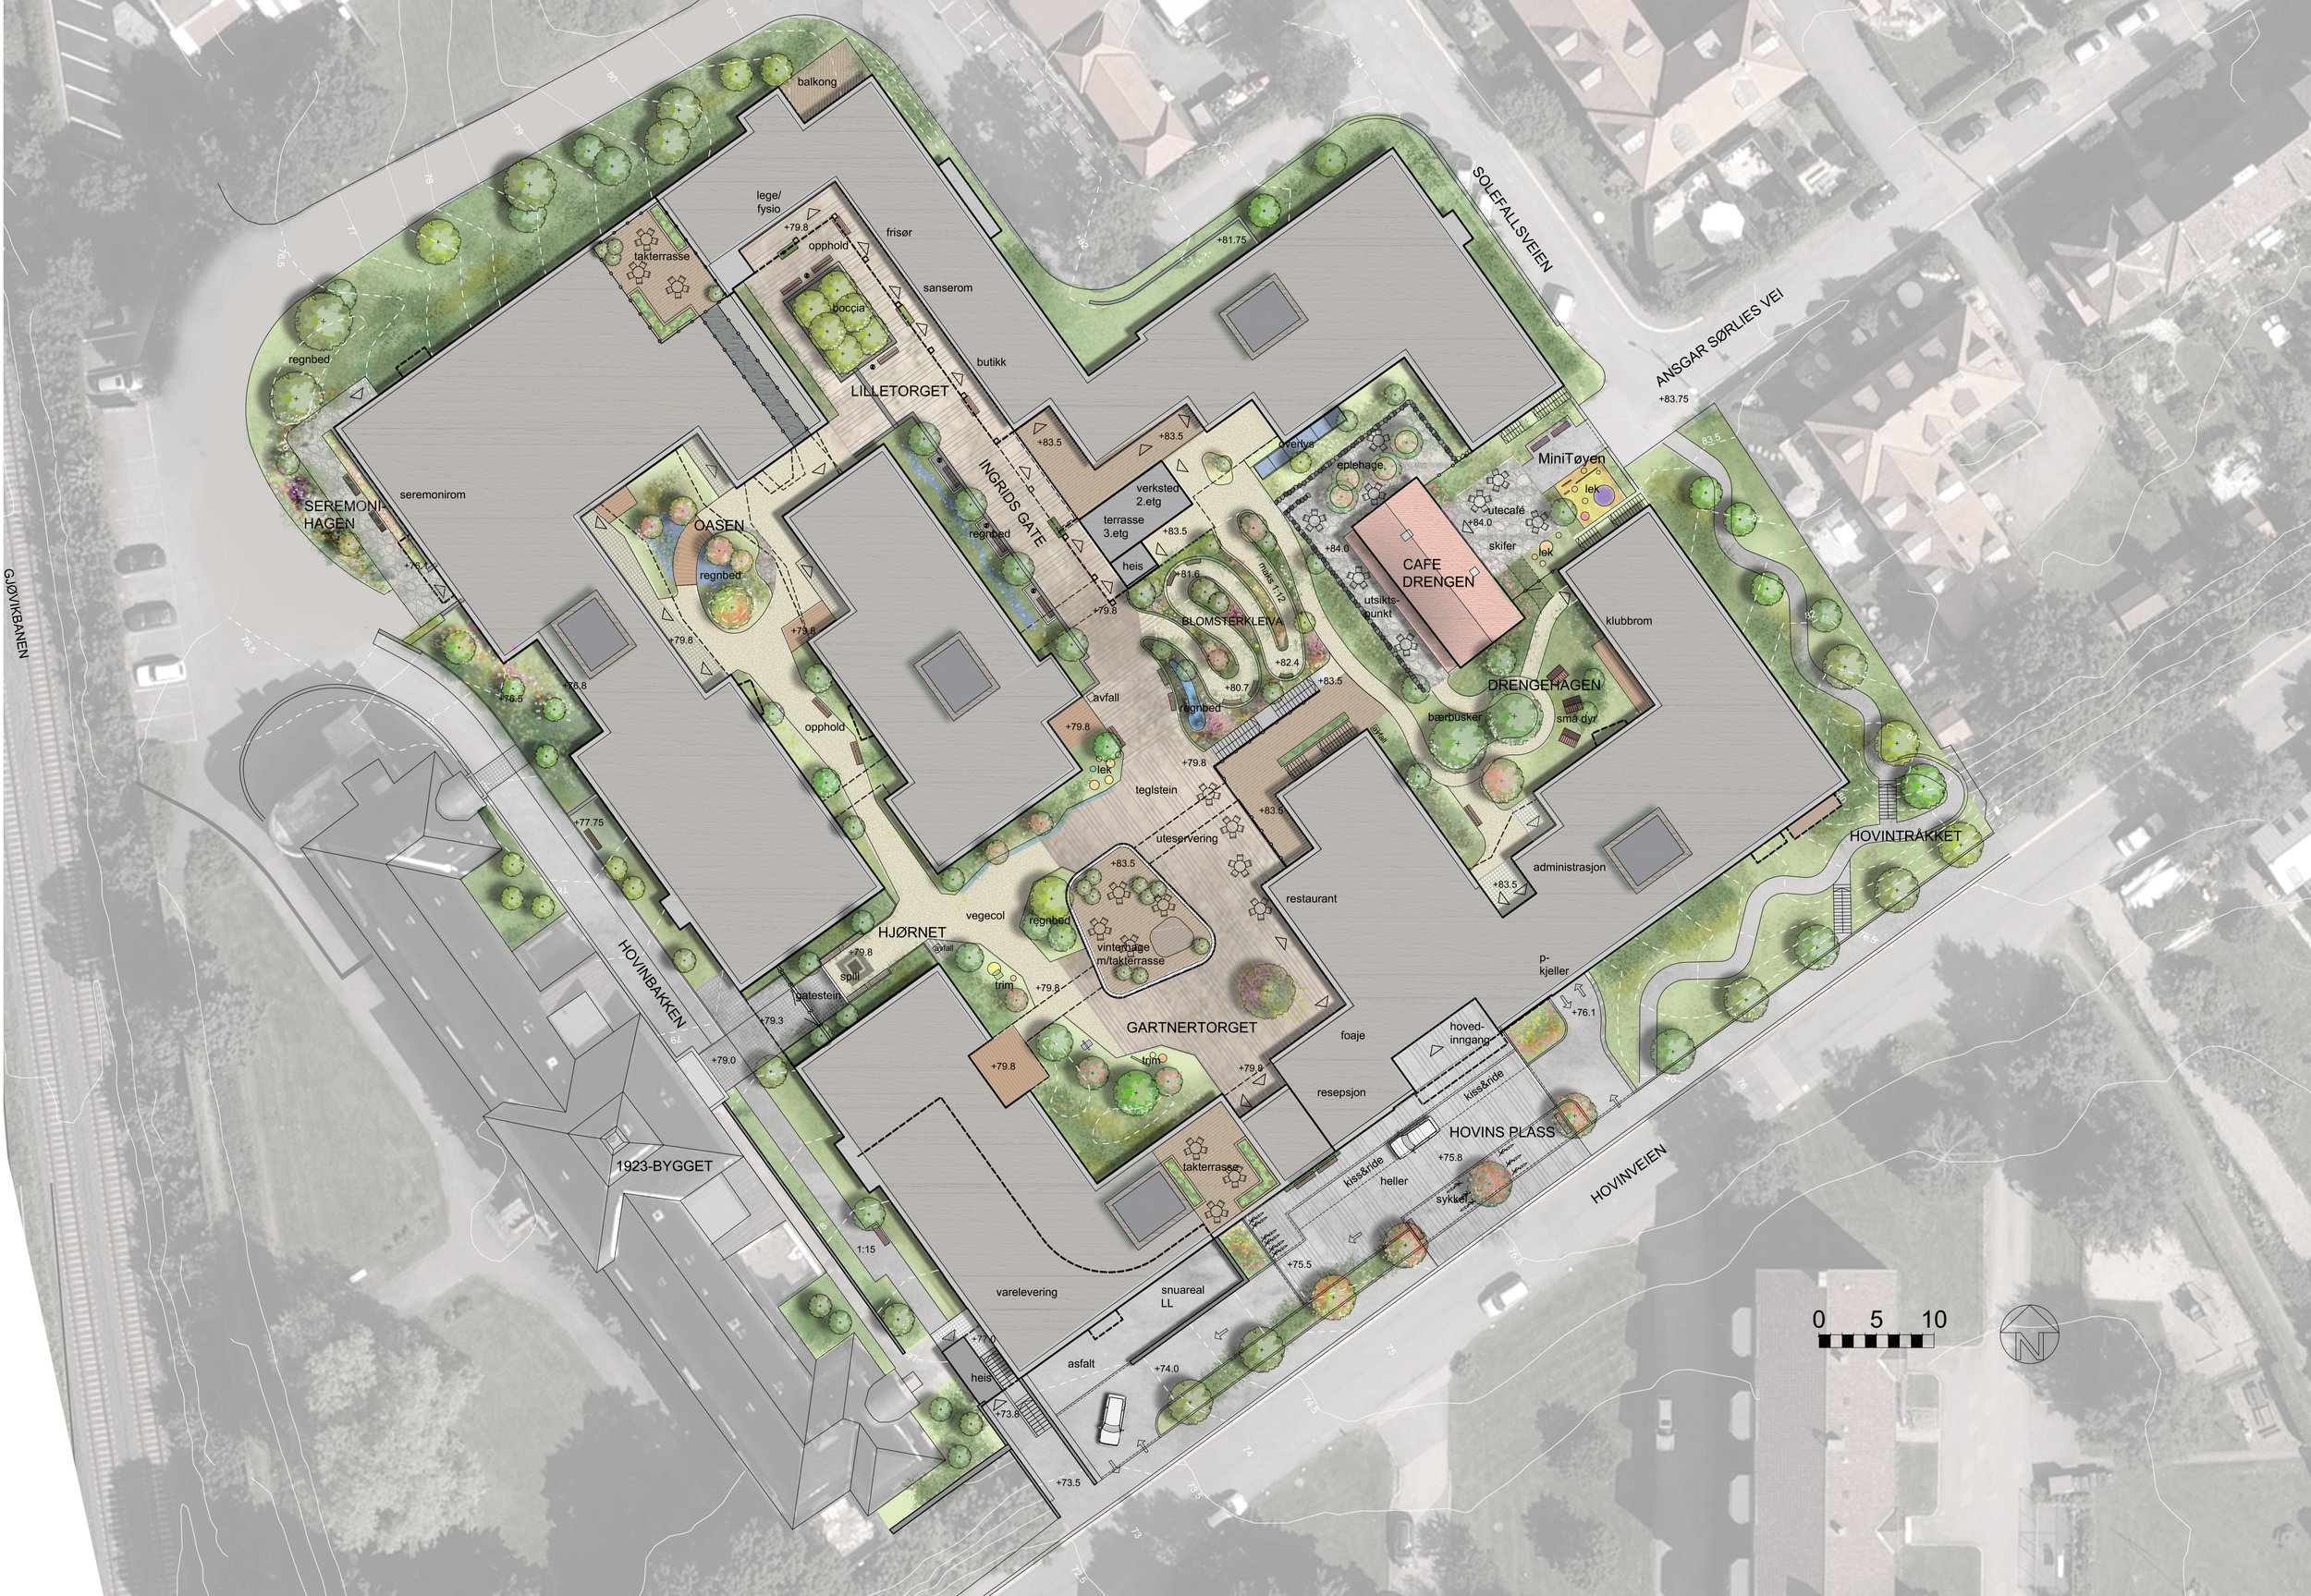 DIH_Planforum Arkitekter og Landskaperiet AS-Landskapsplan .jpg